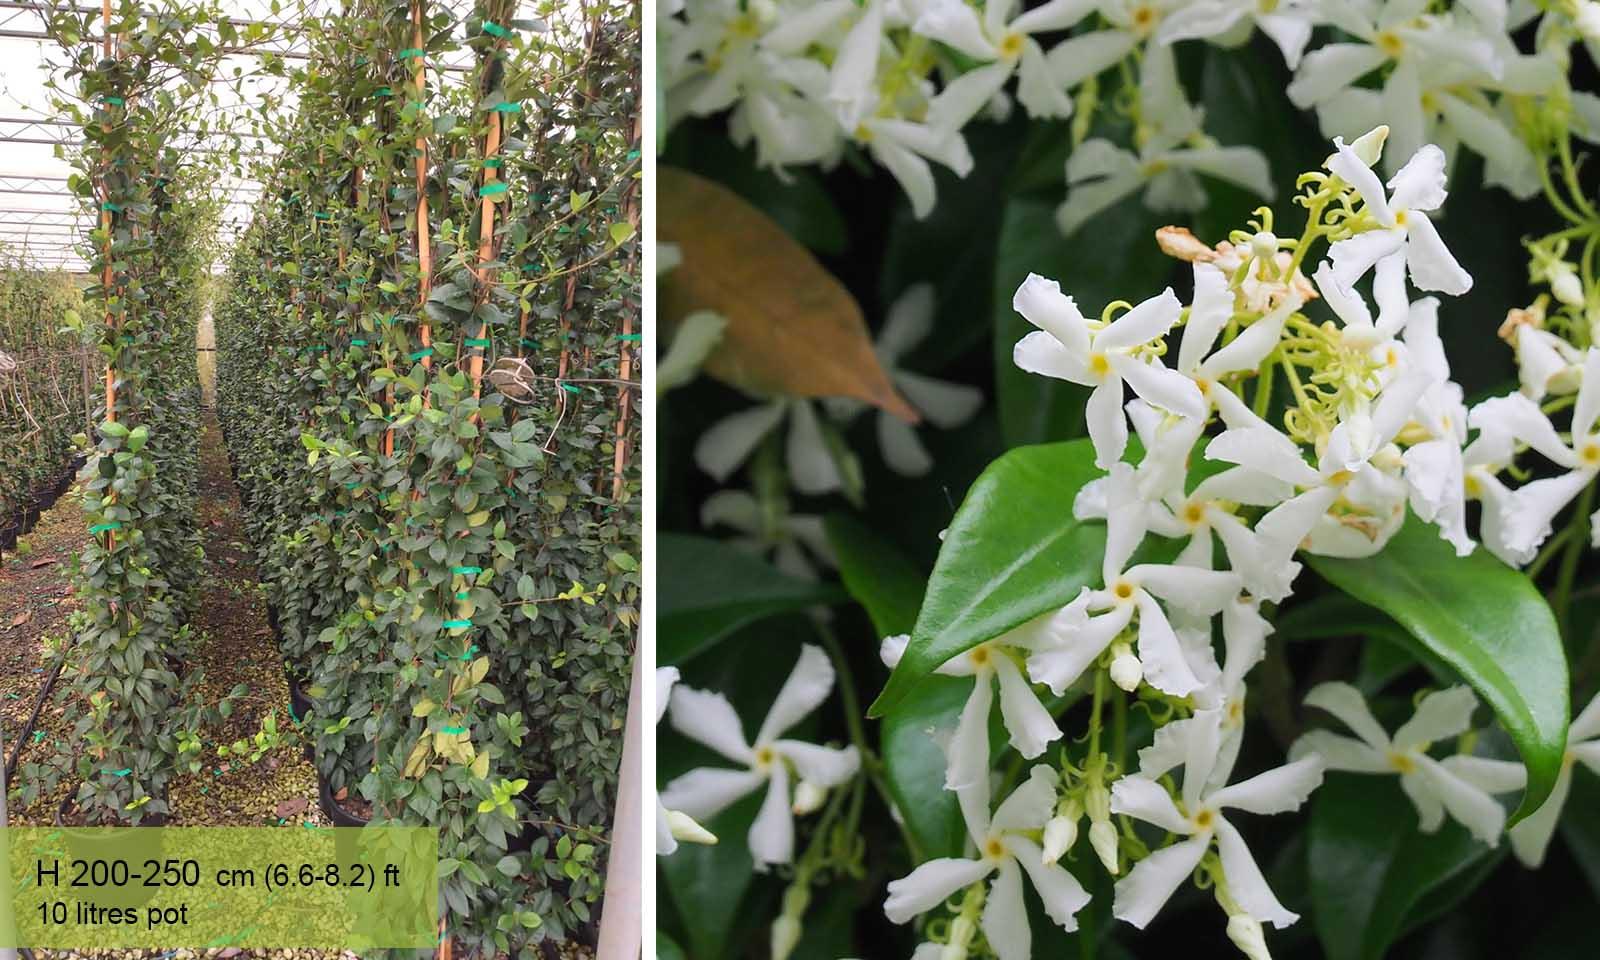 Rhyncospermum Jasminoides (Jasminum) – Climbing